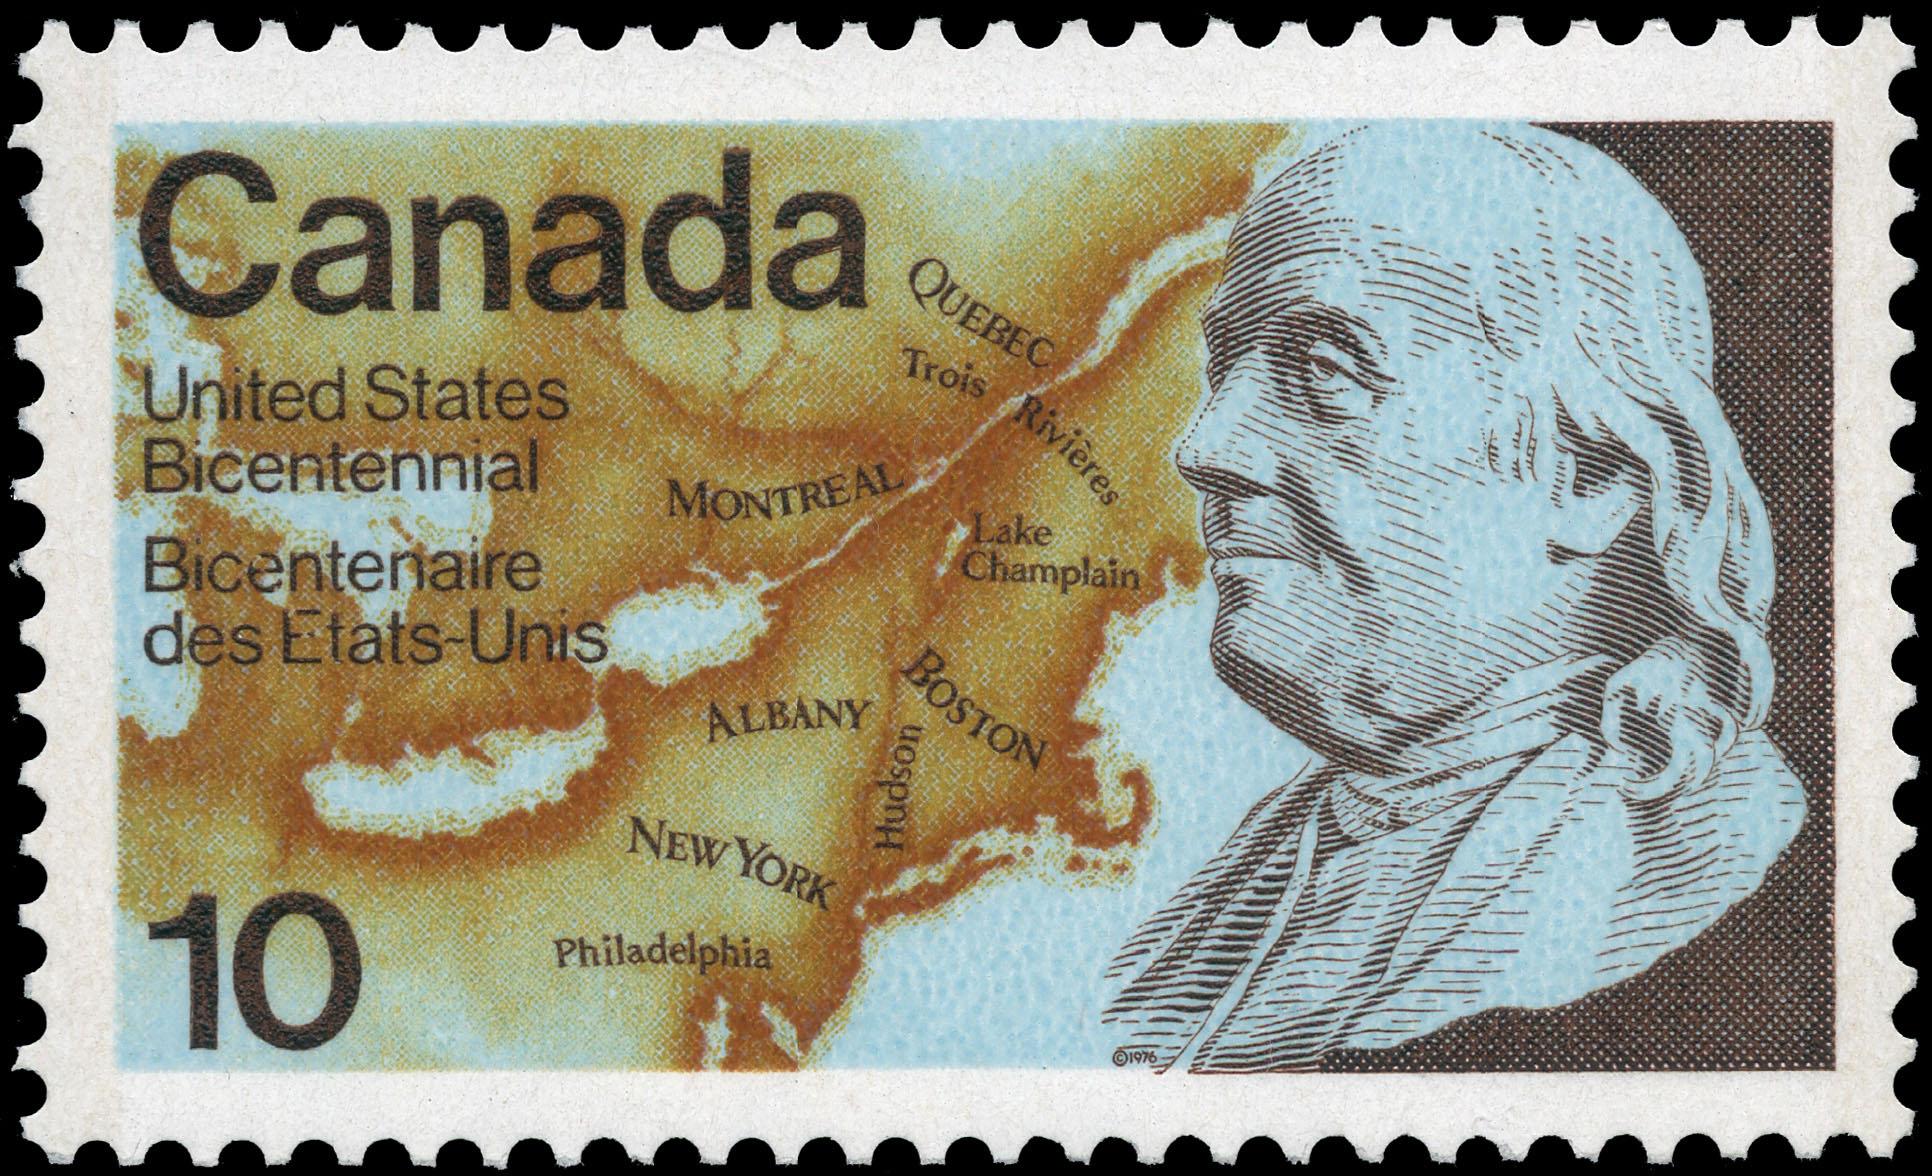 United States Bicentennial Benjamin Franklin